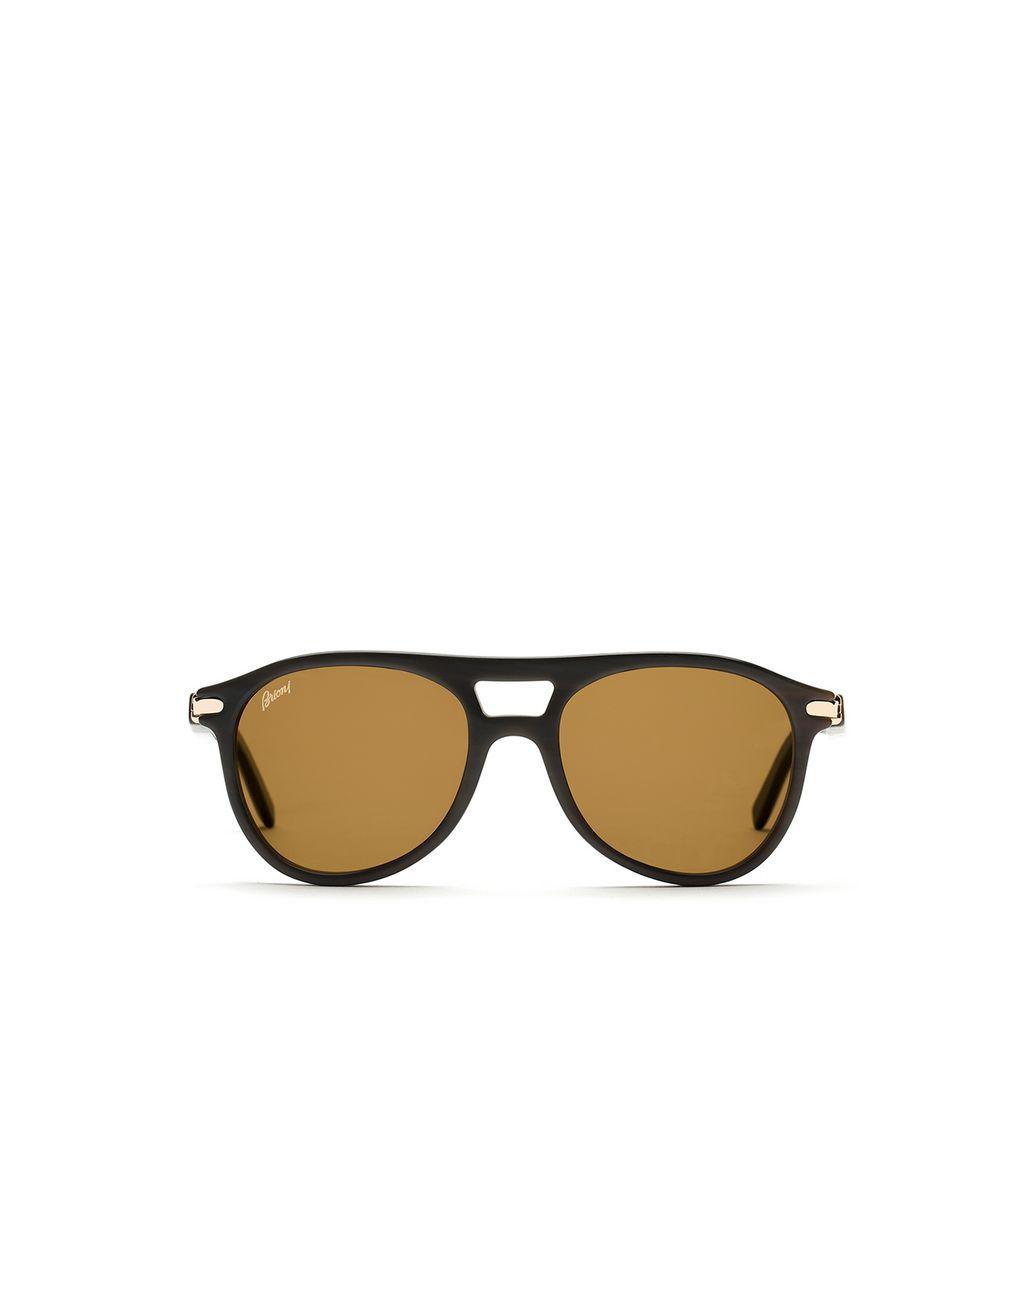 b5d490b8ee BRIONI Sunglasses Sunglasses      pickupInStoreShippingNotGuaranteed info       f